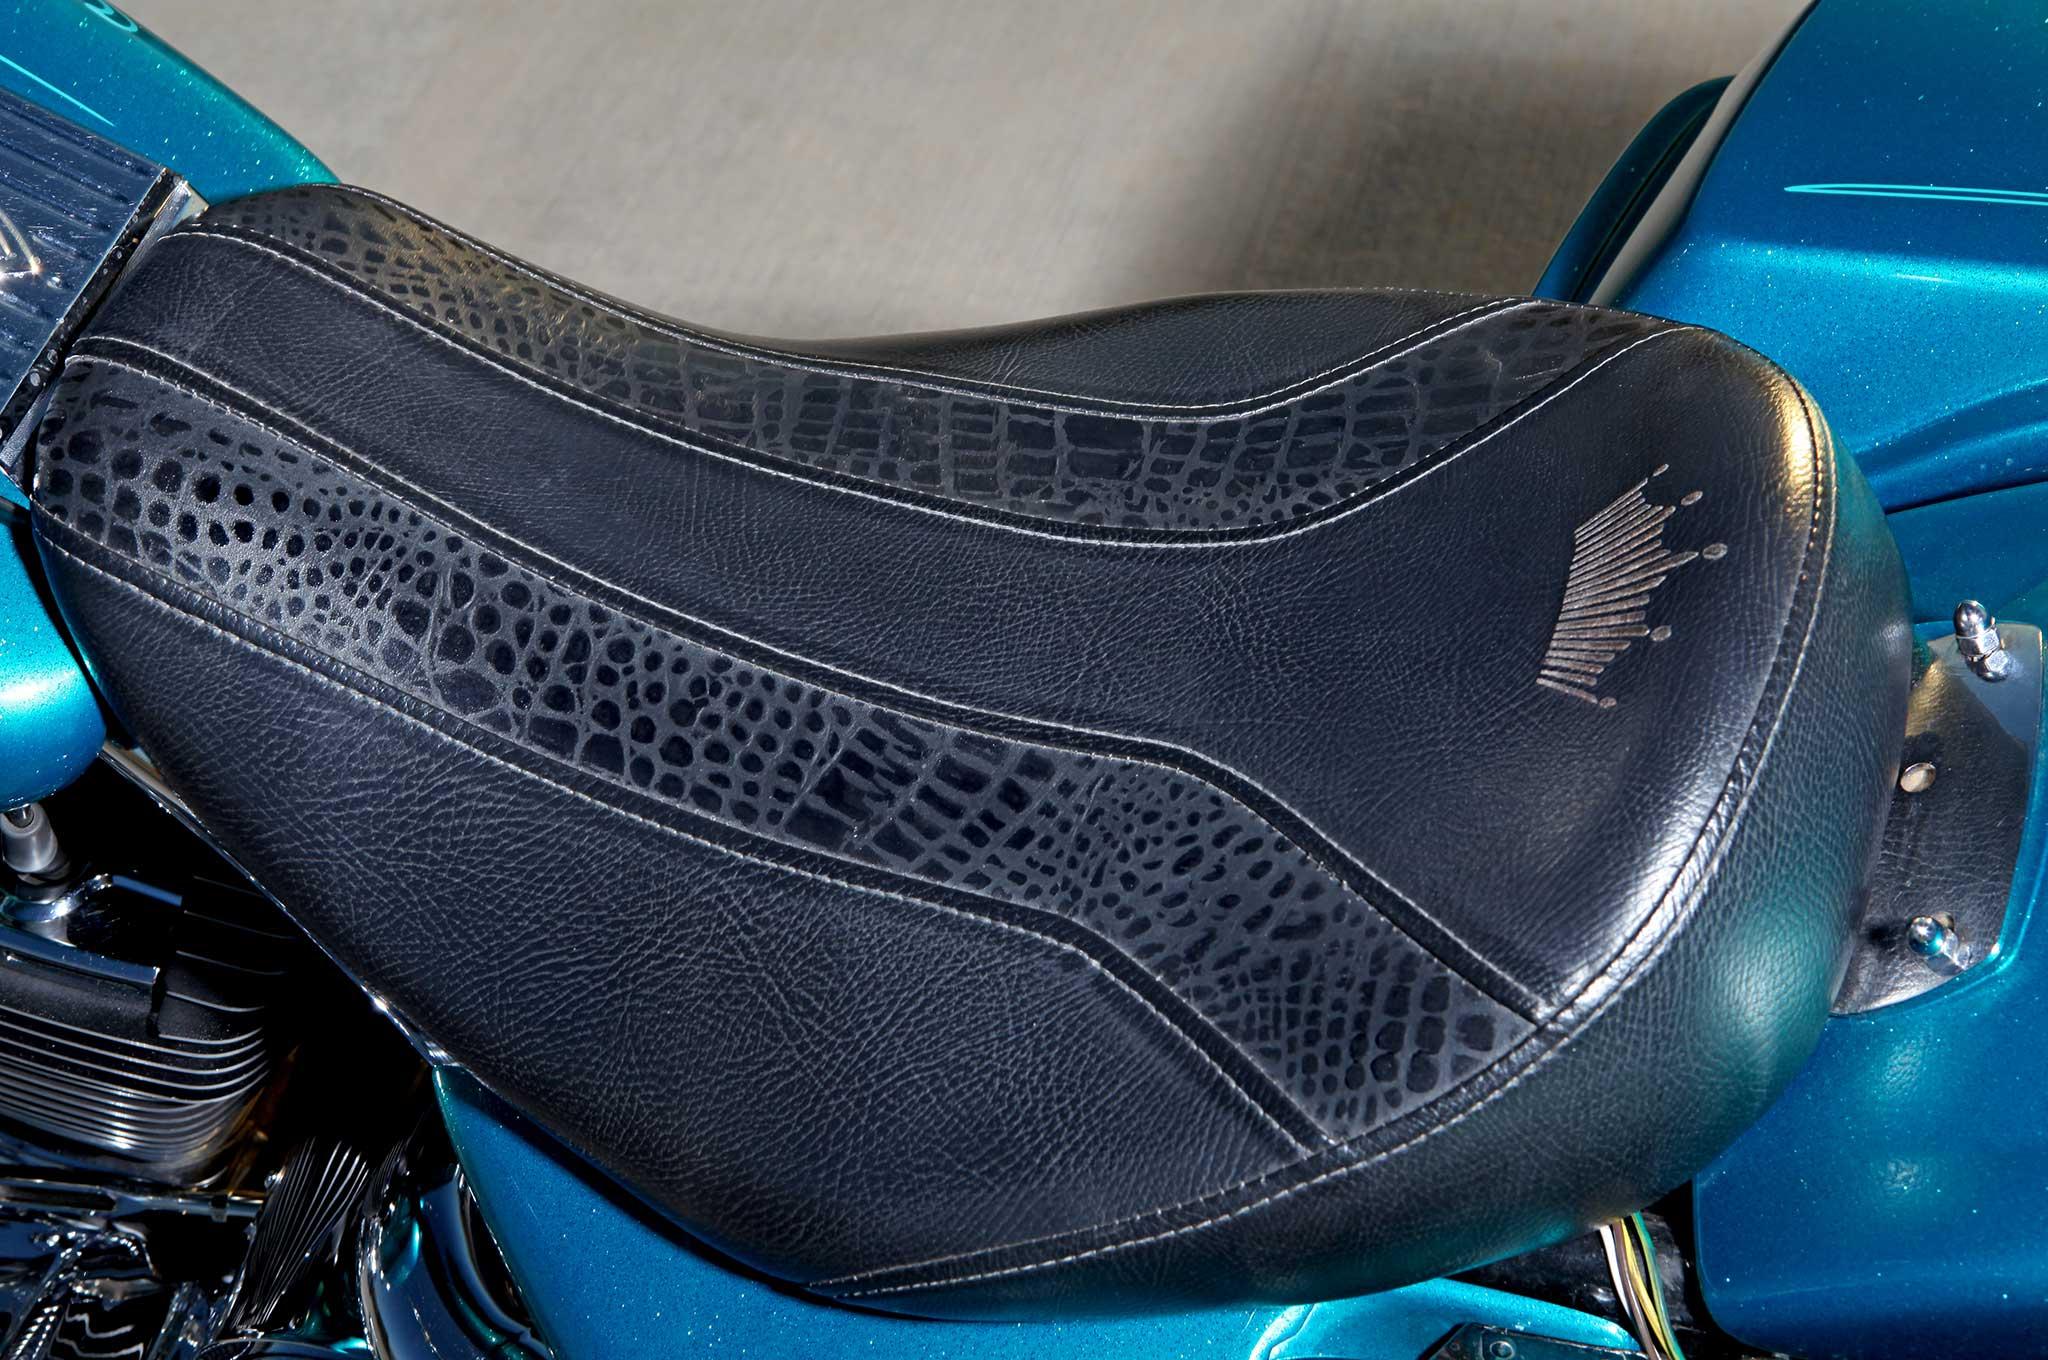 2004 harley davidson road king black leather and alligator seat 021